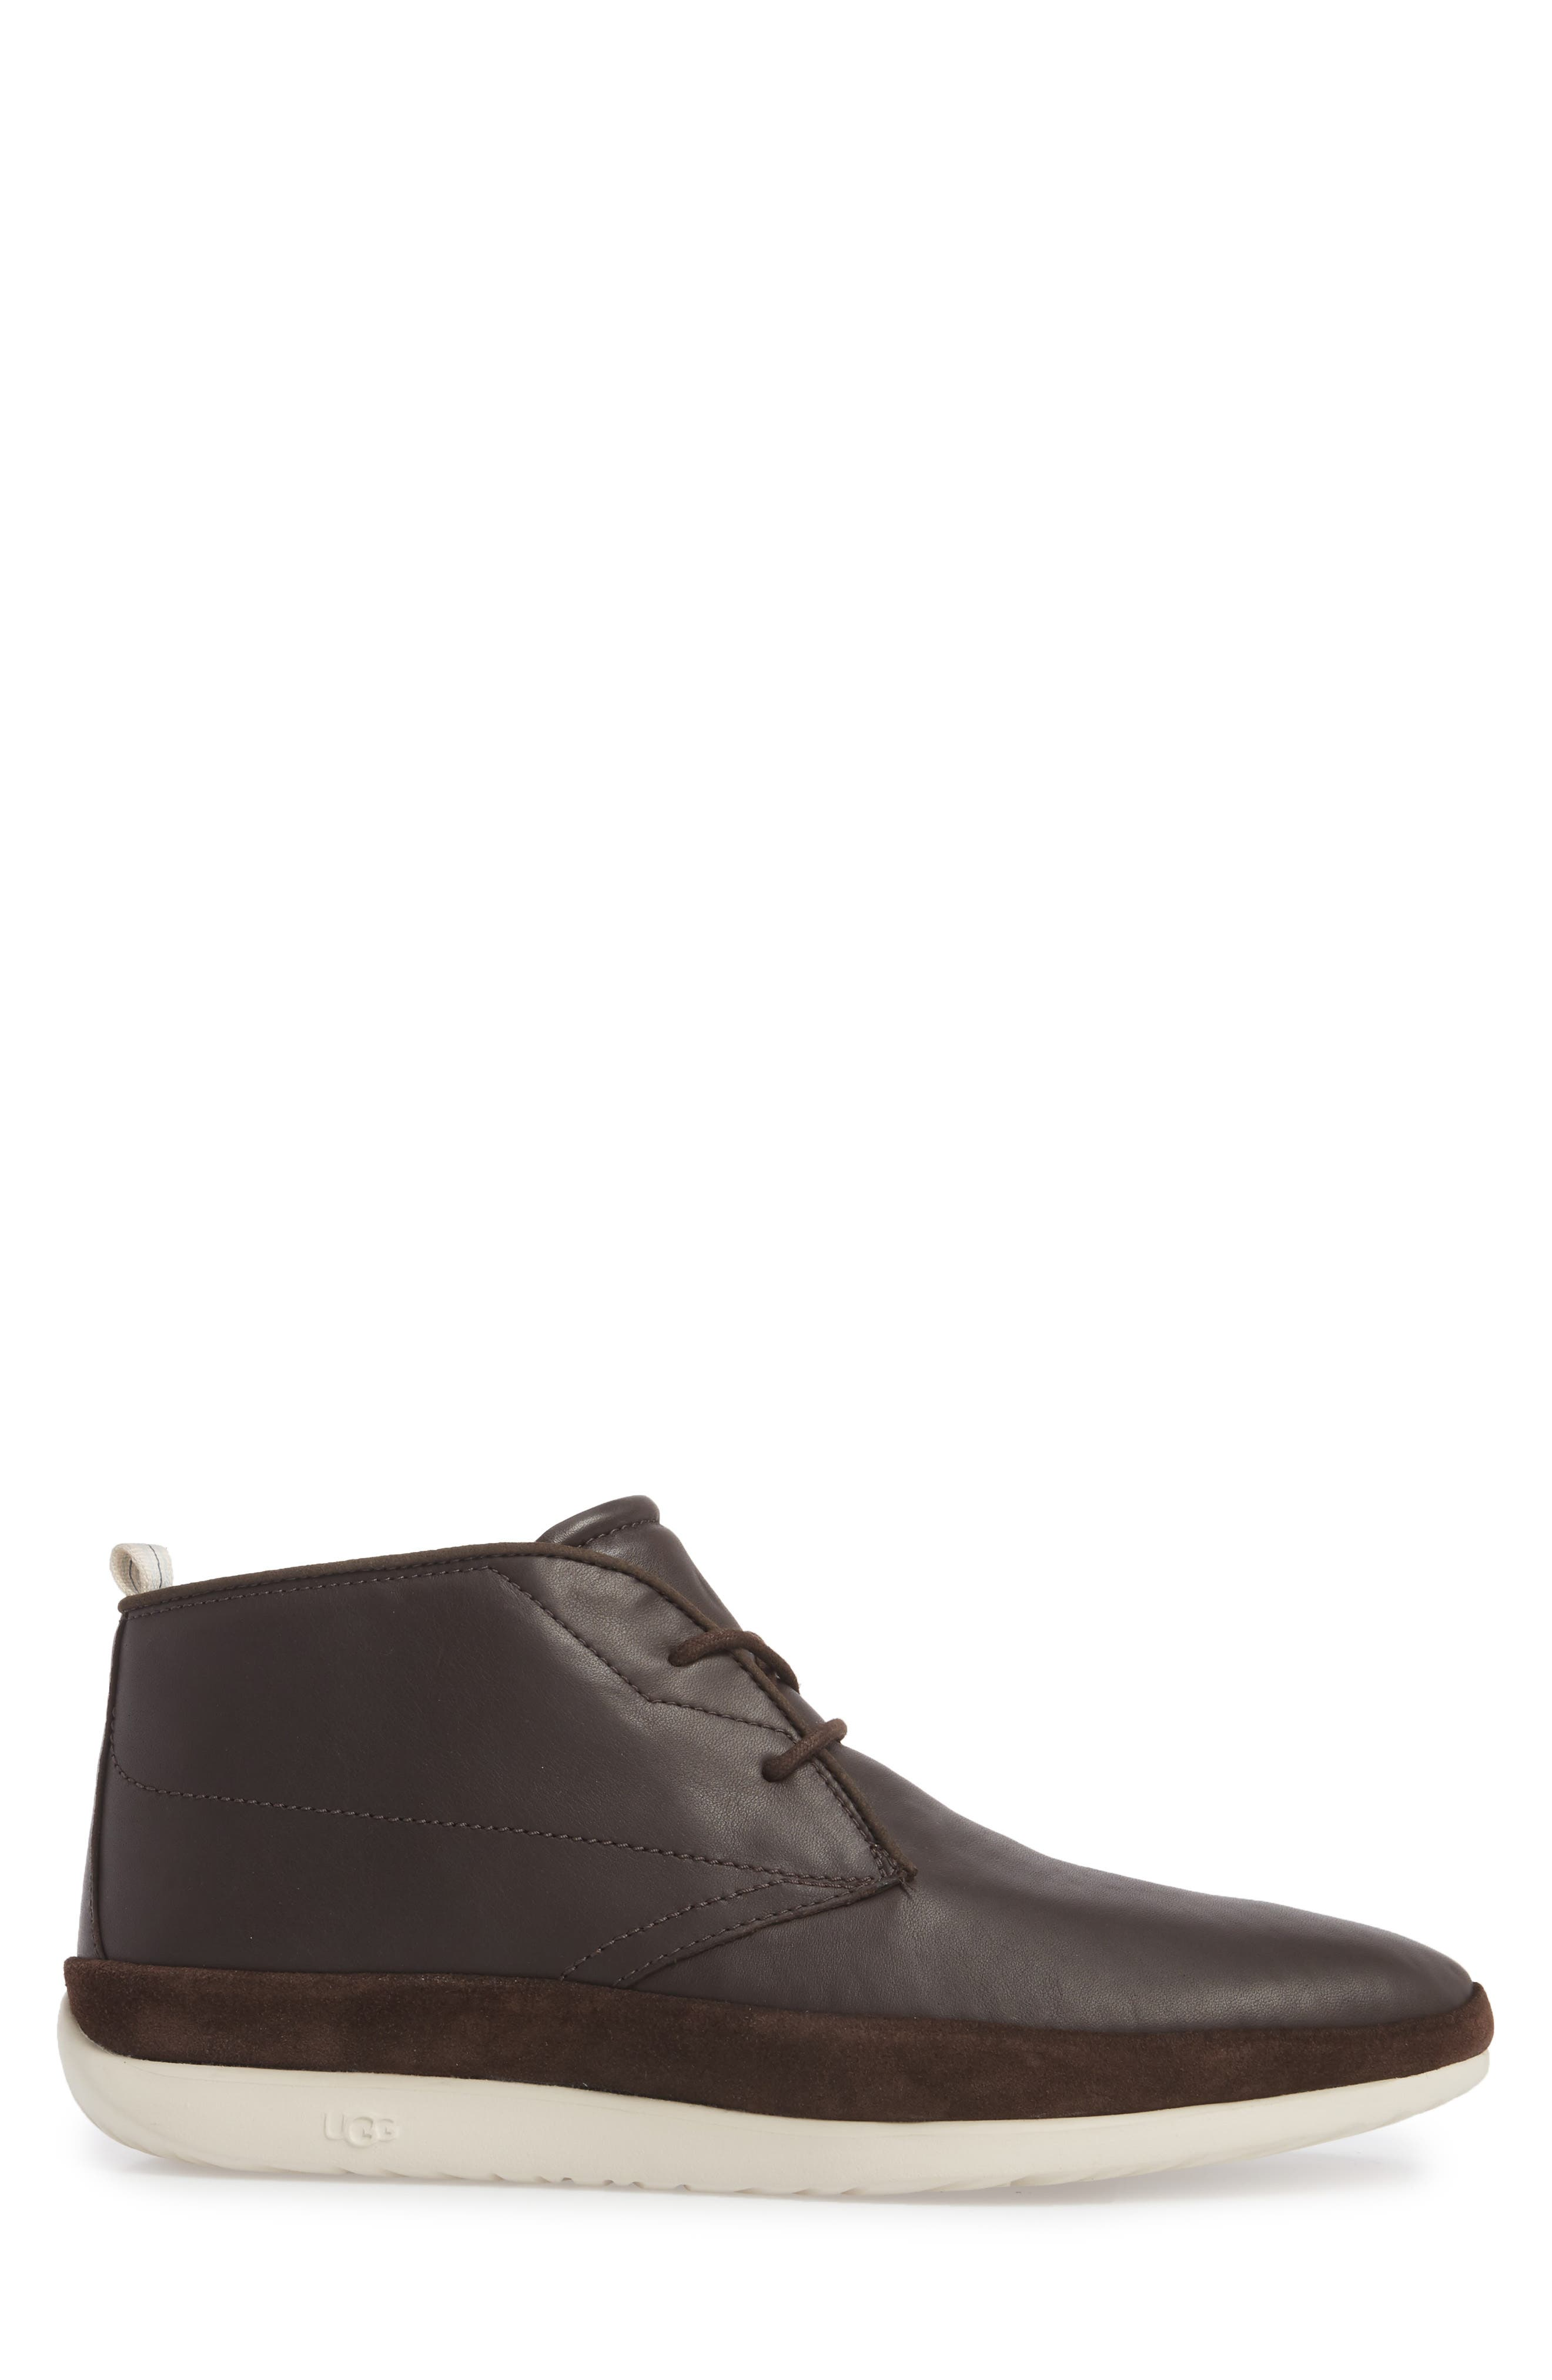 Cali Chukka Boot,                             Alternate thumbnail 3, color,                             Stout Leather